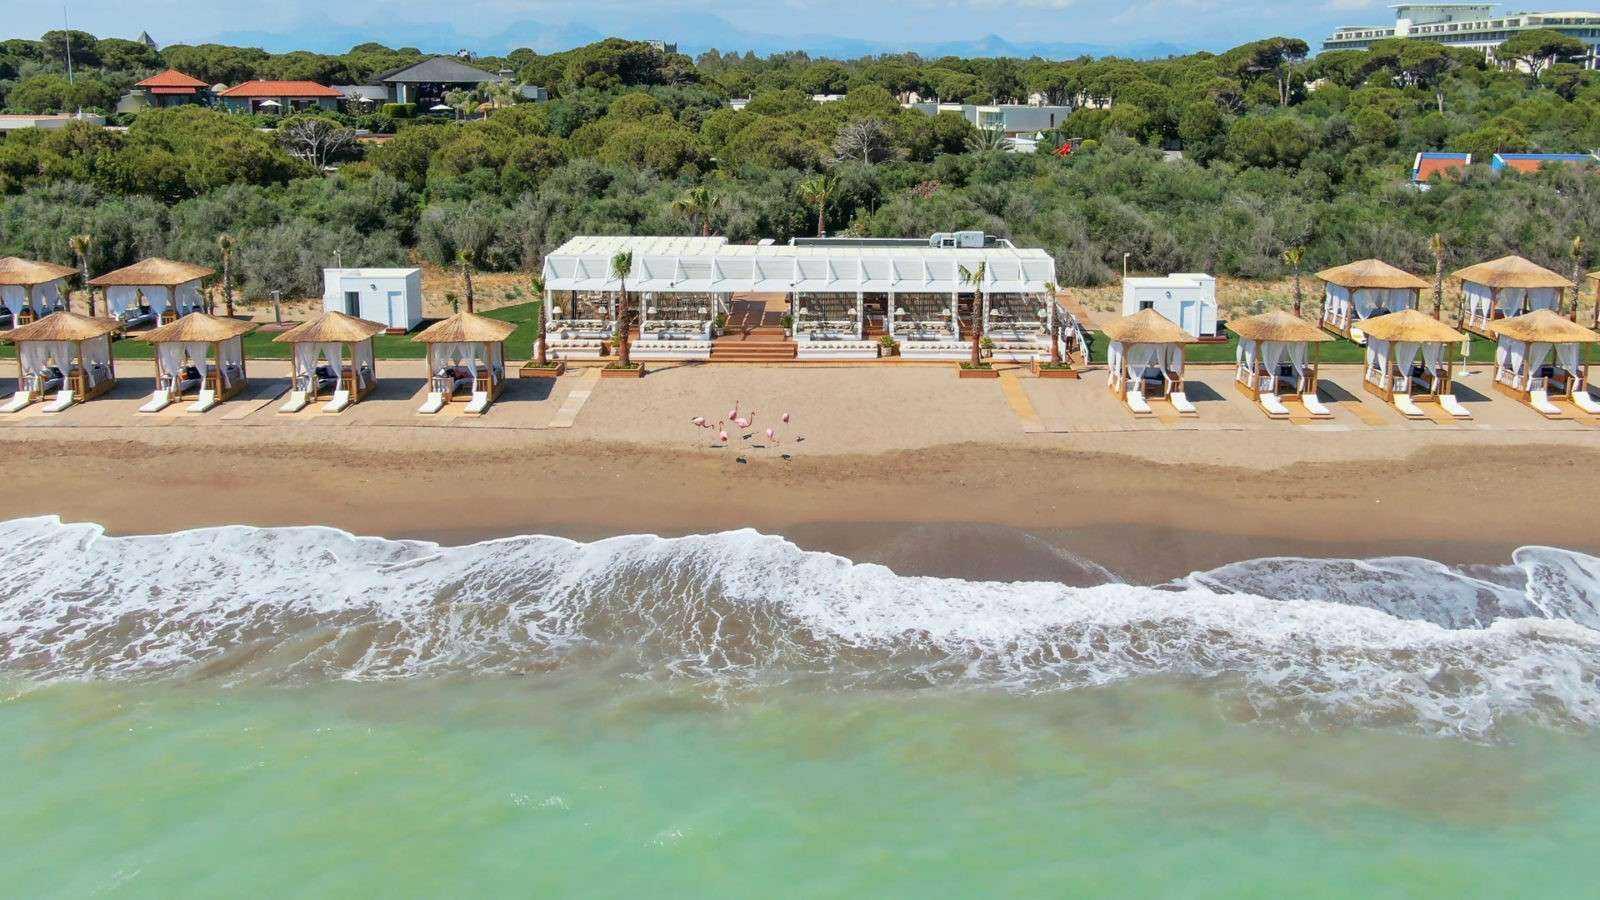 Club-Prive-by-Rixos-Premium-Belek-Pavilions-and-beach